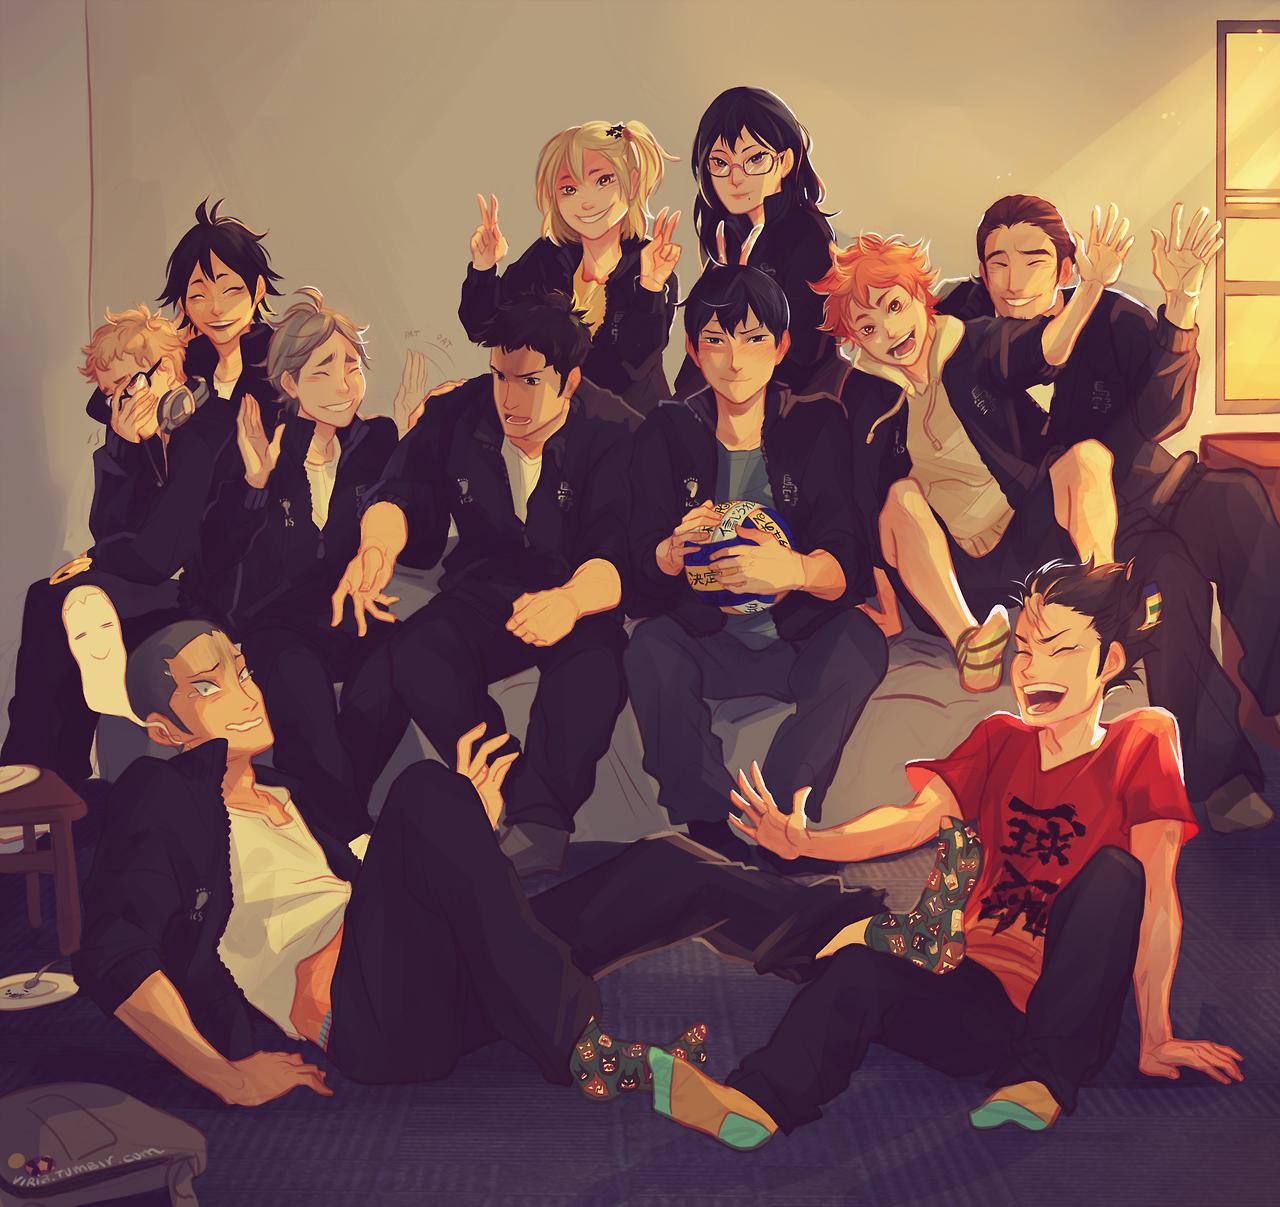 The Team by Viria Haikyuu!! Anime Imagenes chibi